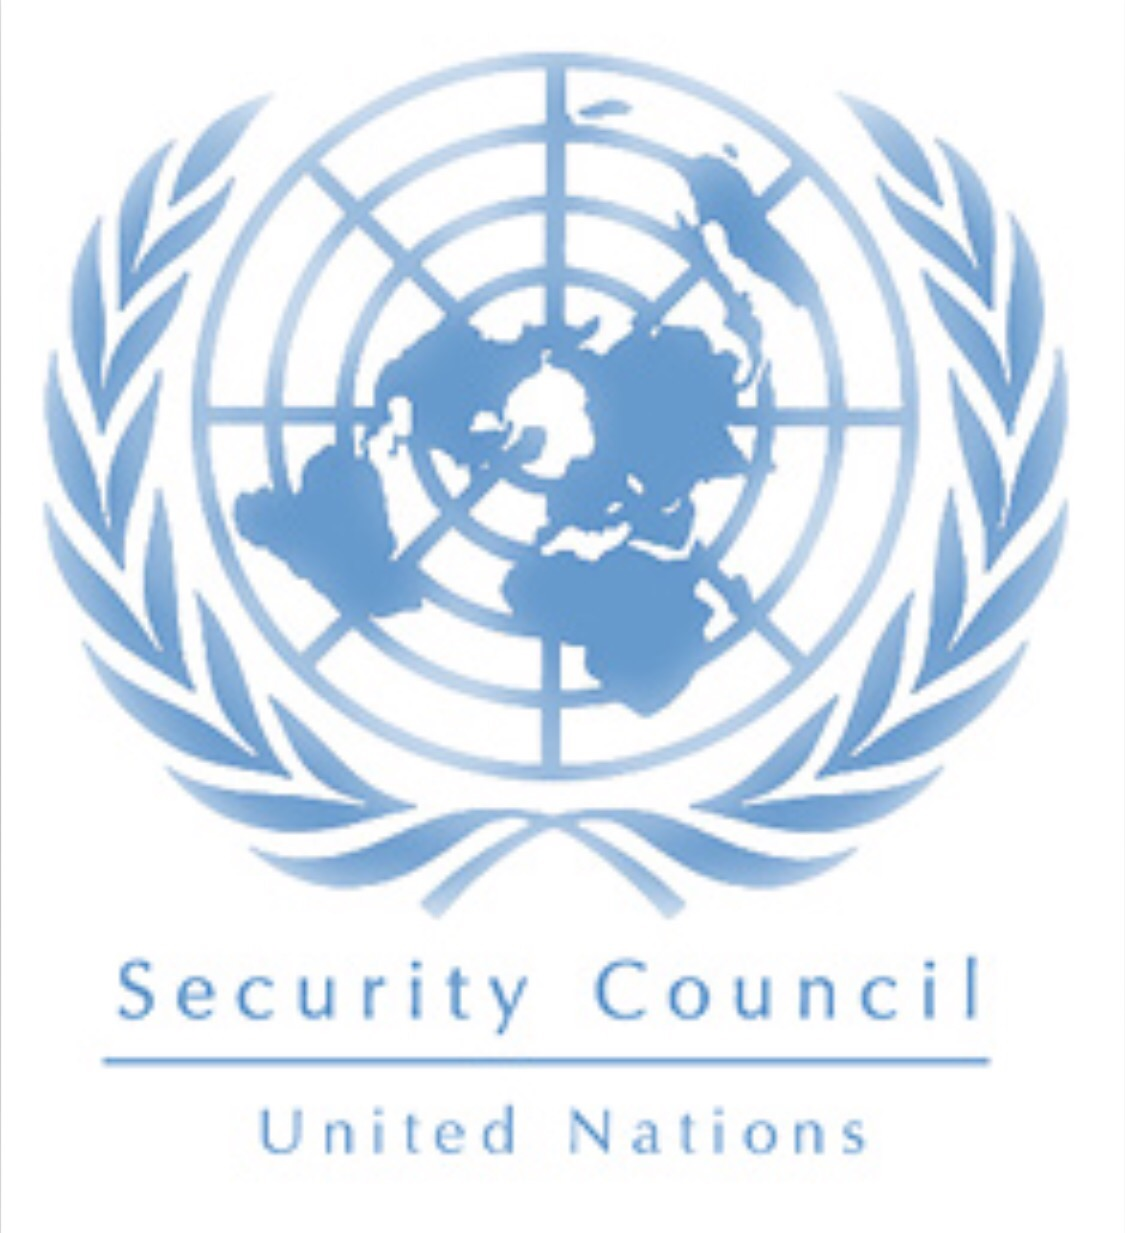 Un Security Council Worksheet